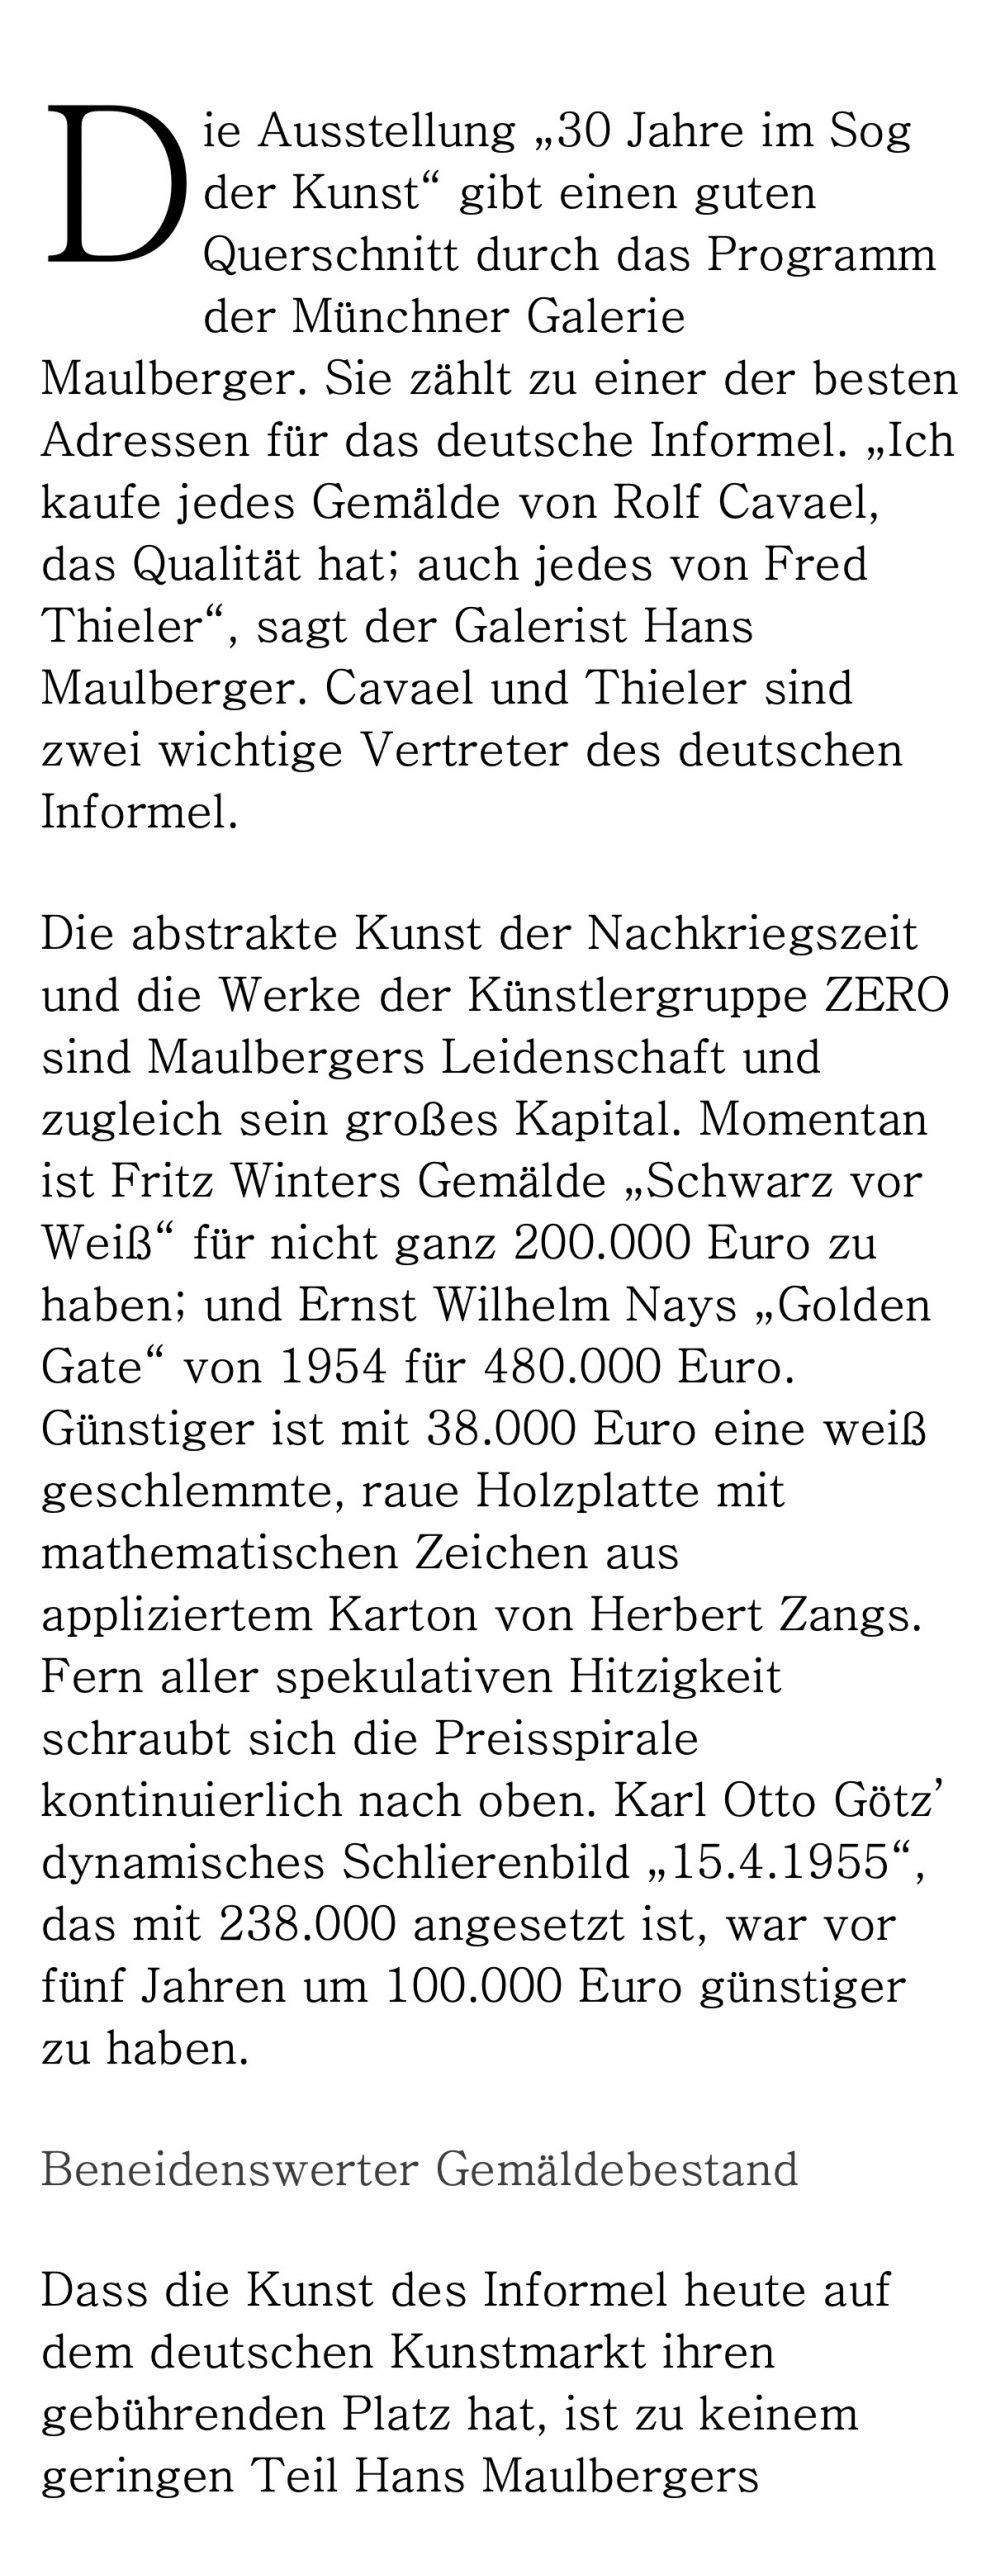 Presse Galerie Maulberger Handelsblatt 2014 02